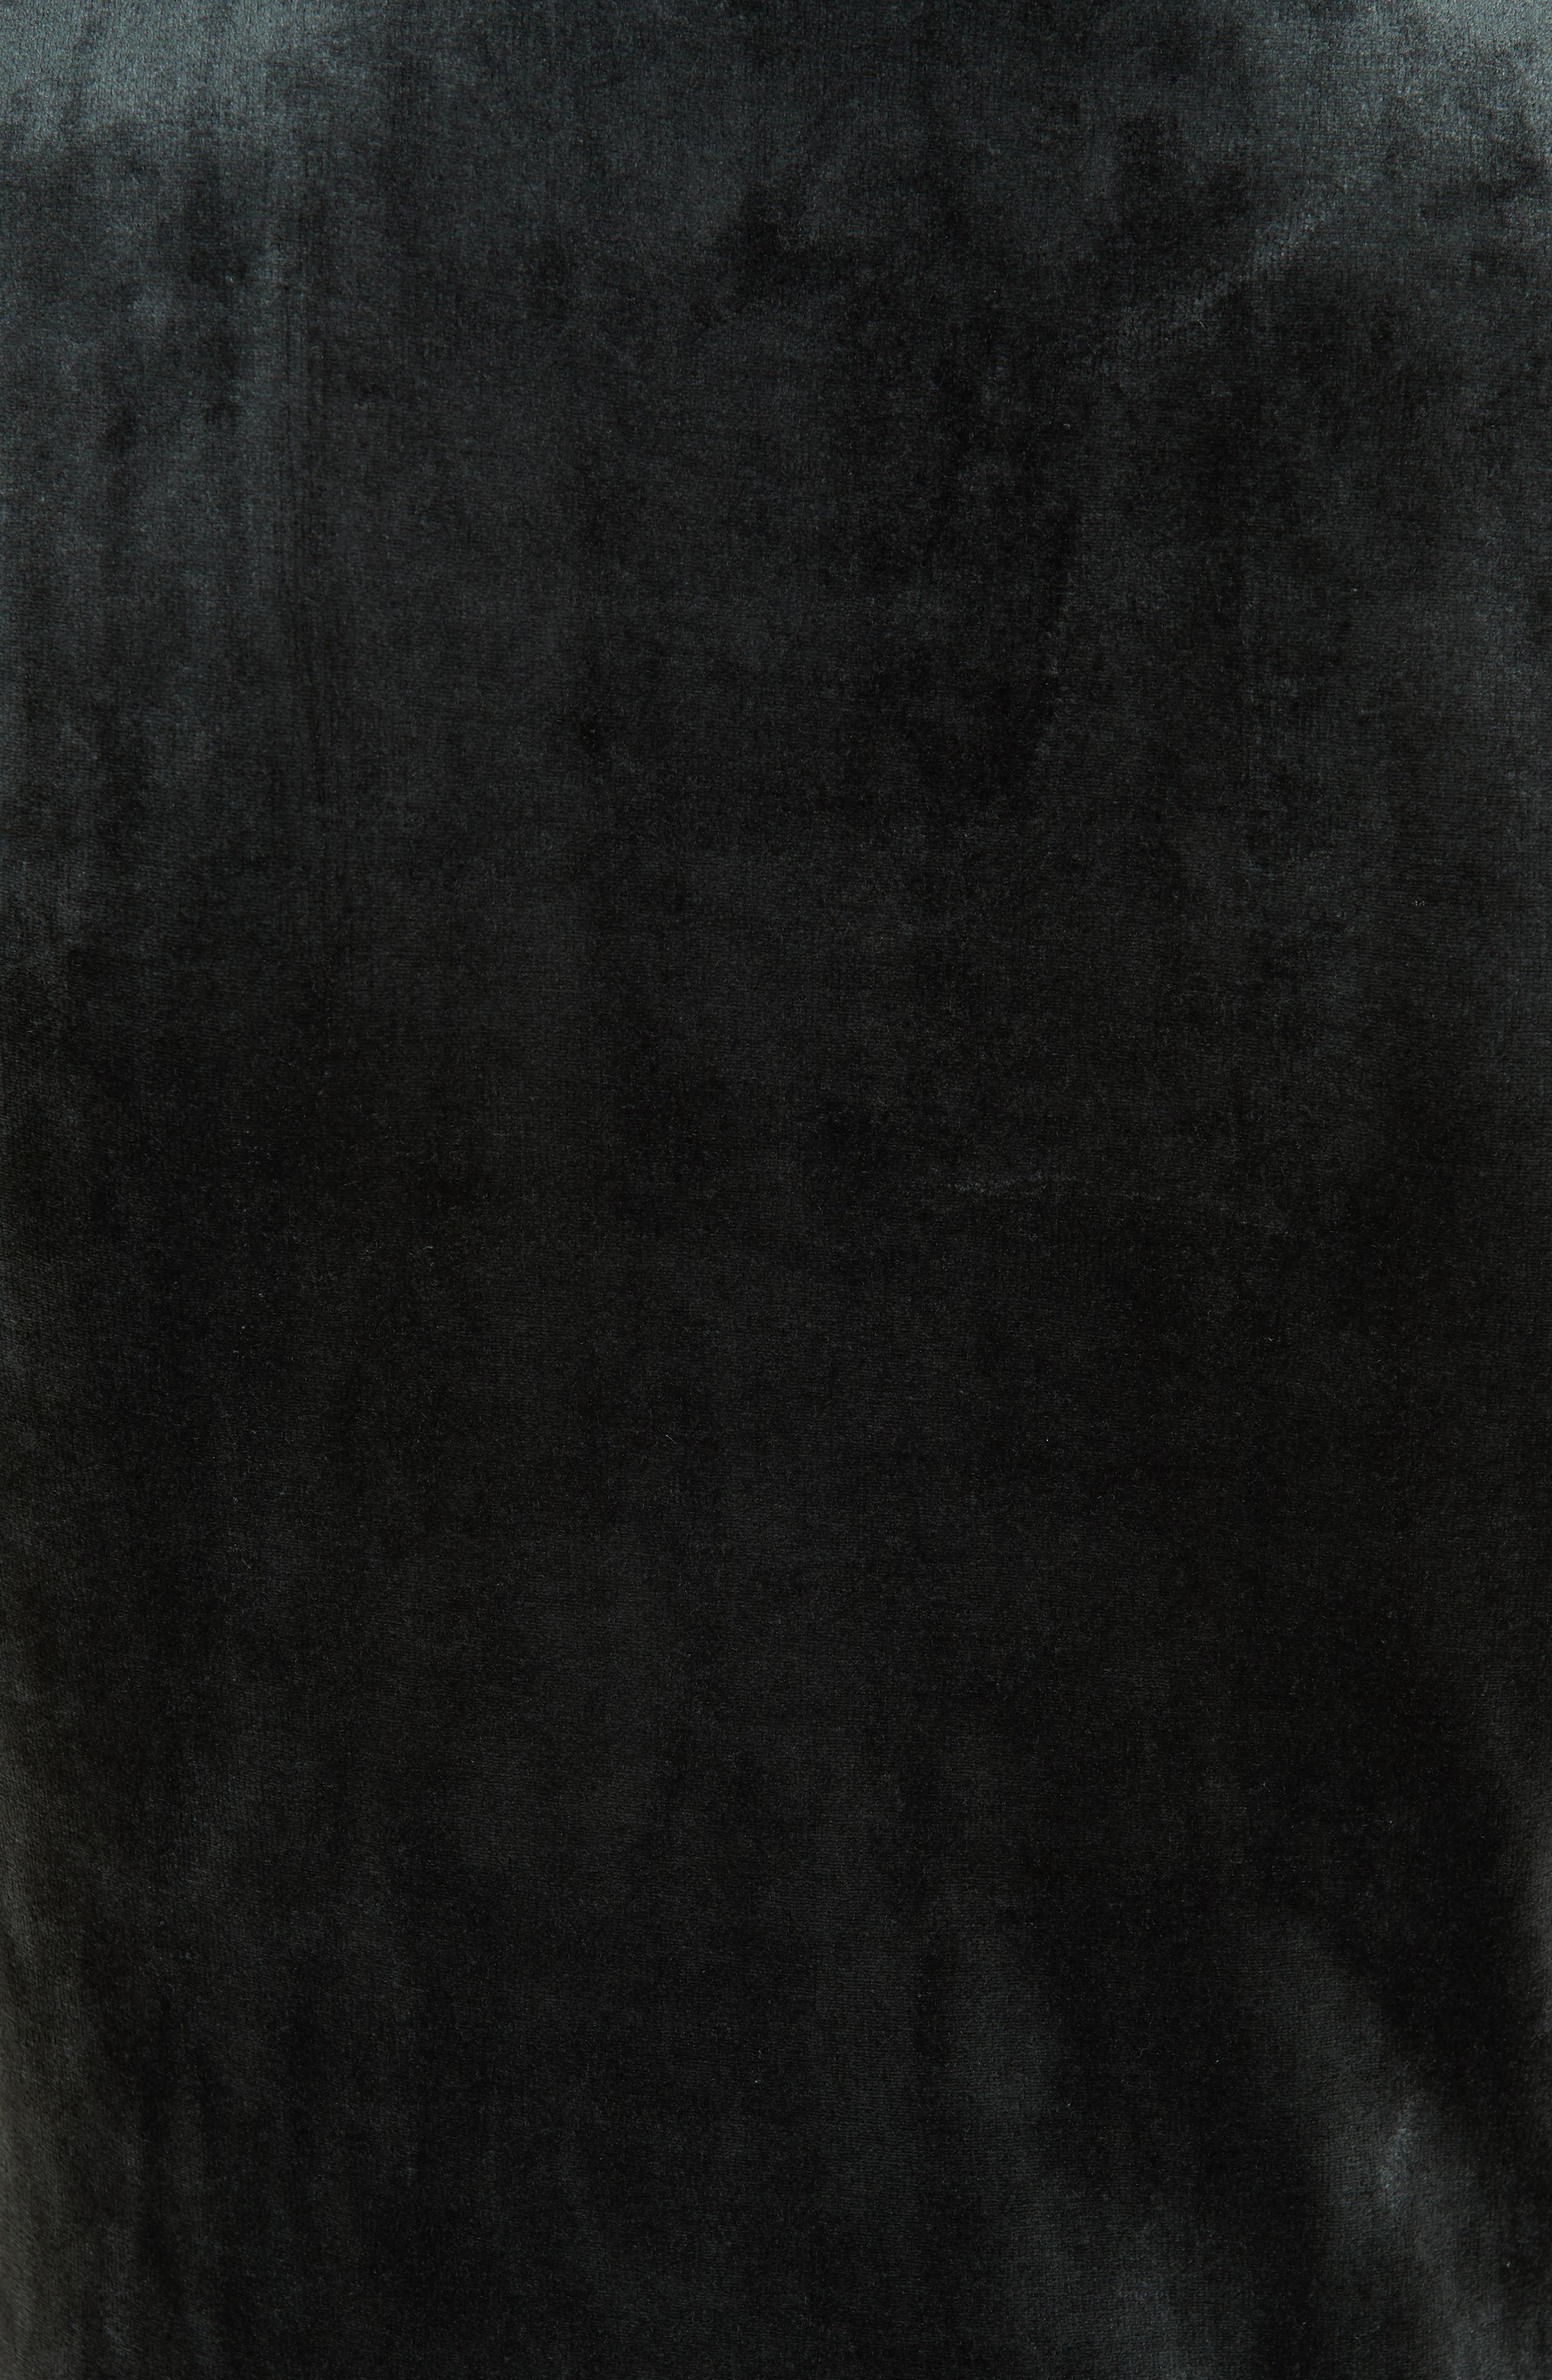 Slim Velour Knit Tank,                             Alternate thumbnail 5, color,                             DARK HOLLY GREEN